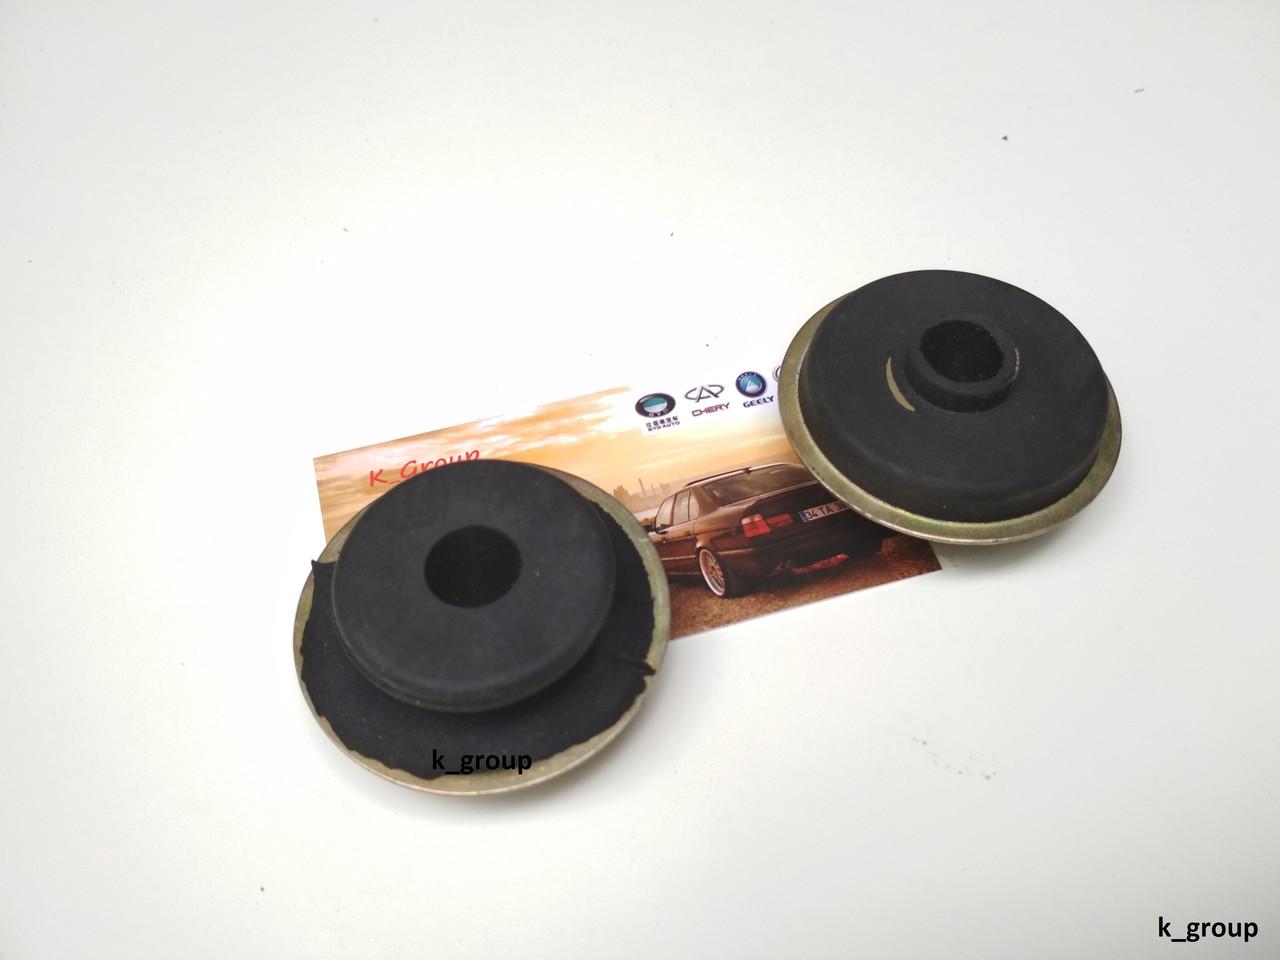 Опора заднего амортизатора верхняя (втулка) Geely MK (Джили МК)